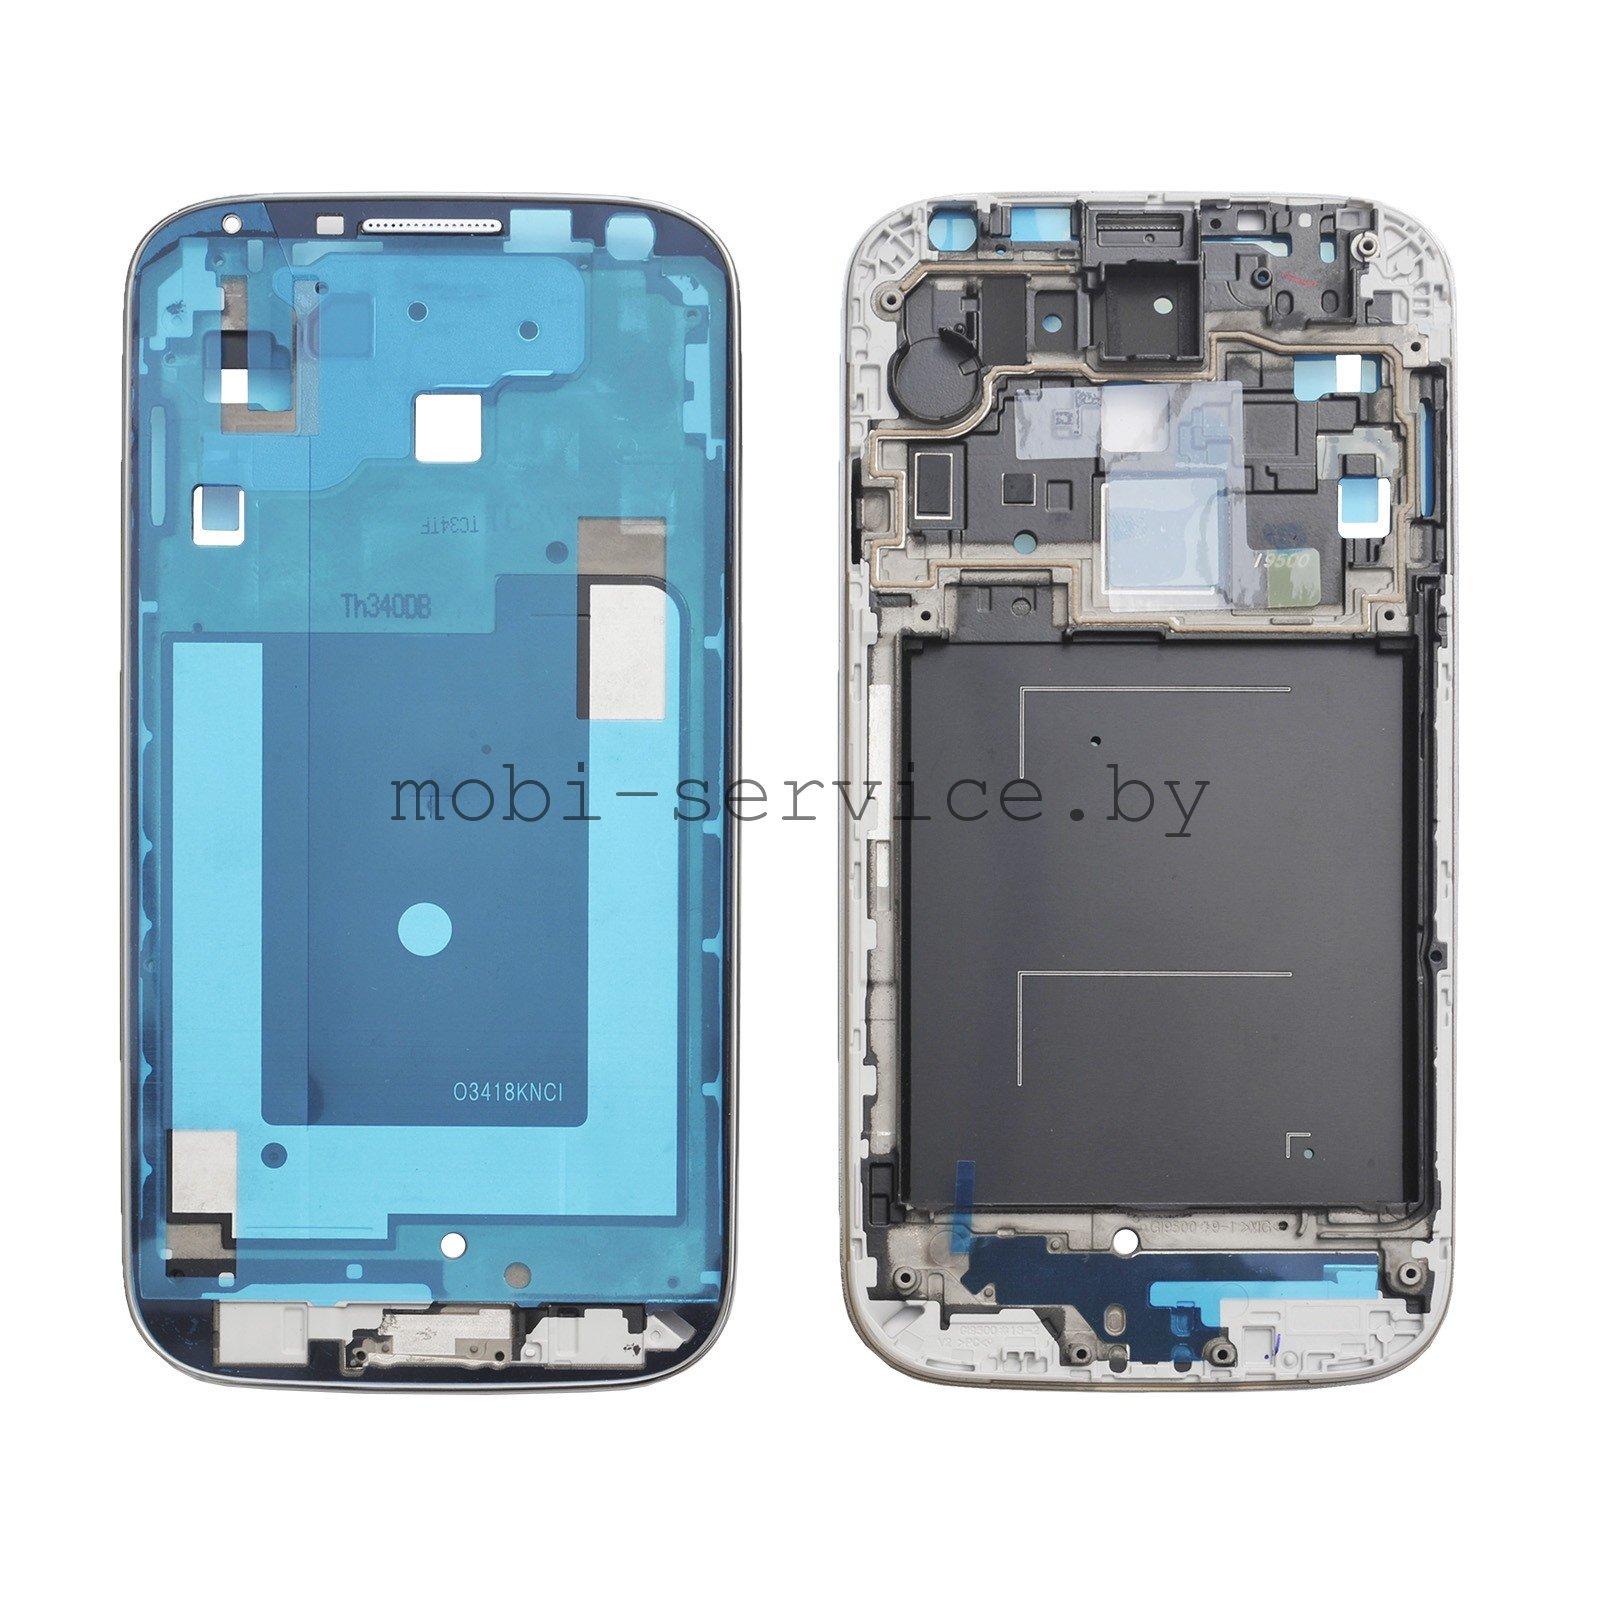 Замена корпуса Samsung Galaxy S4 I9500